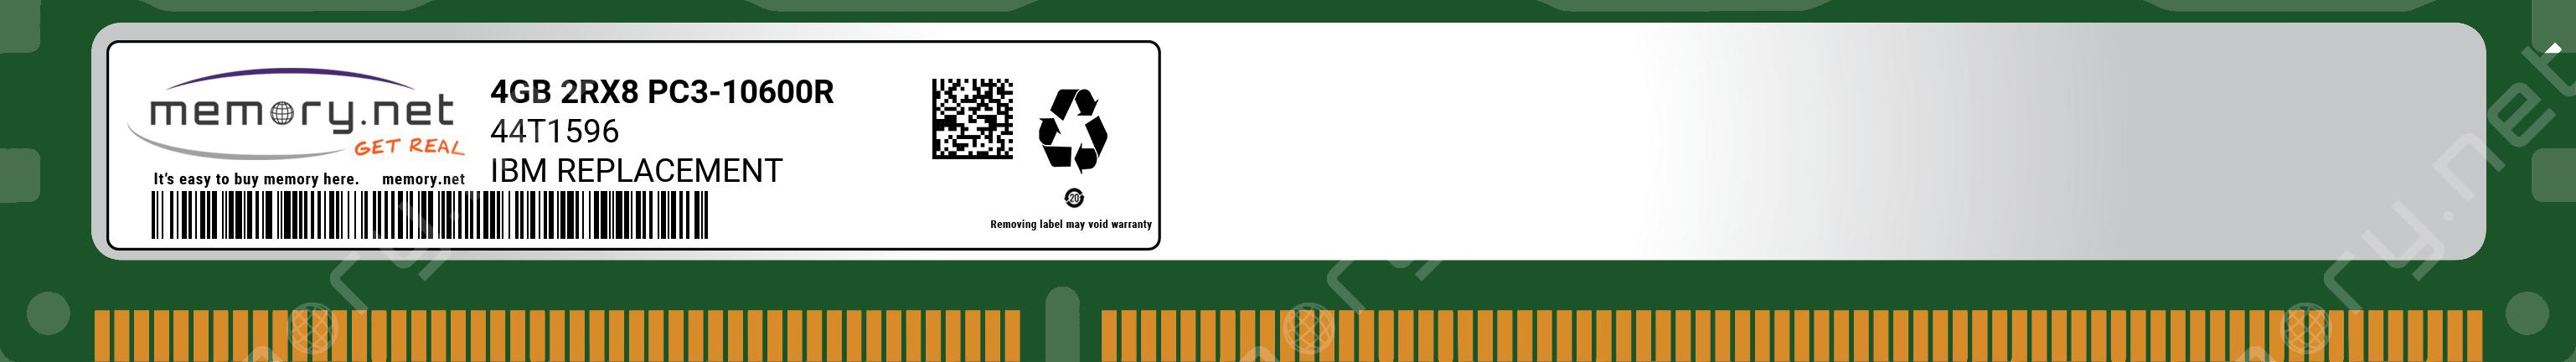 44T1596